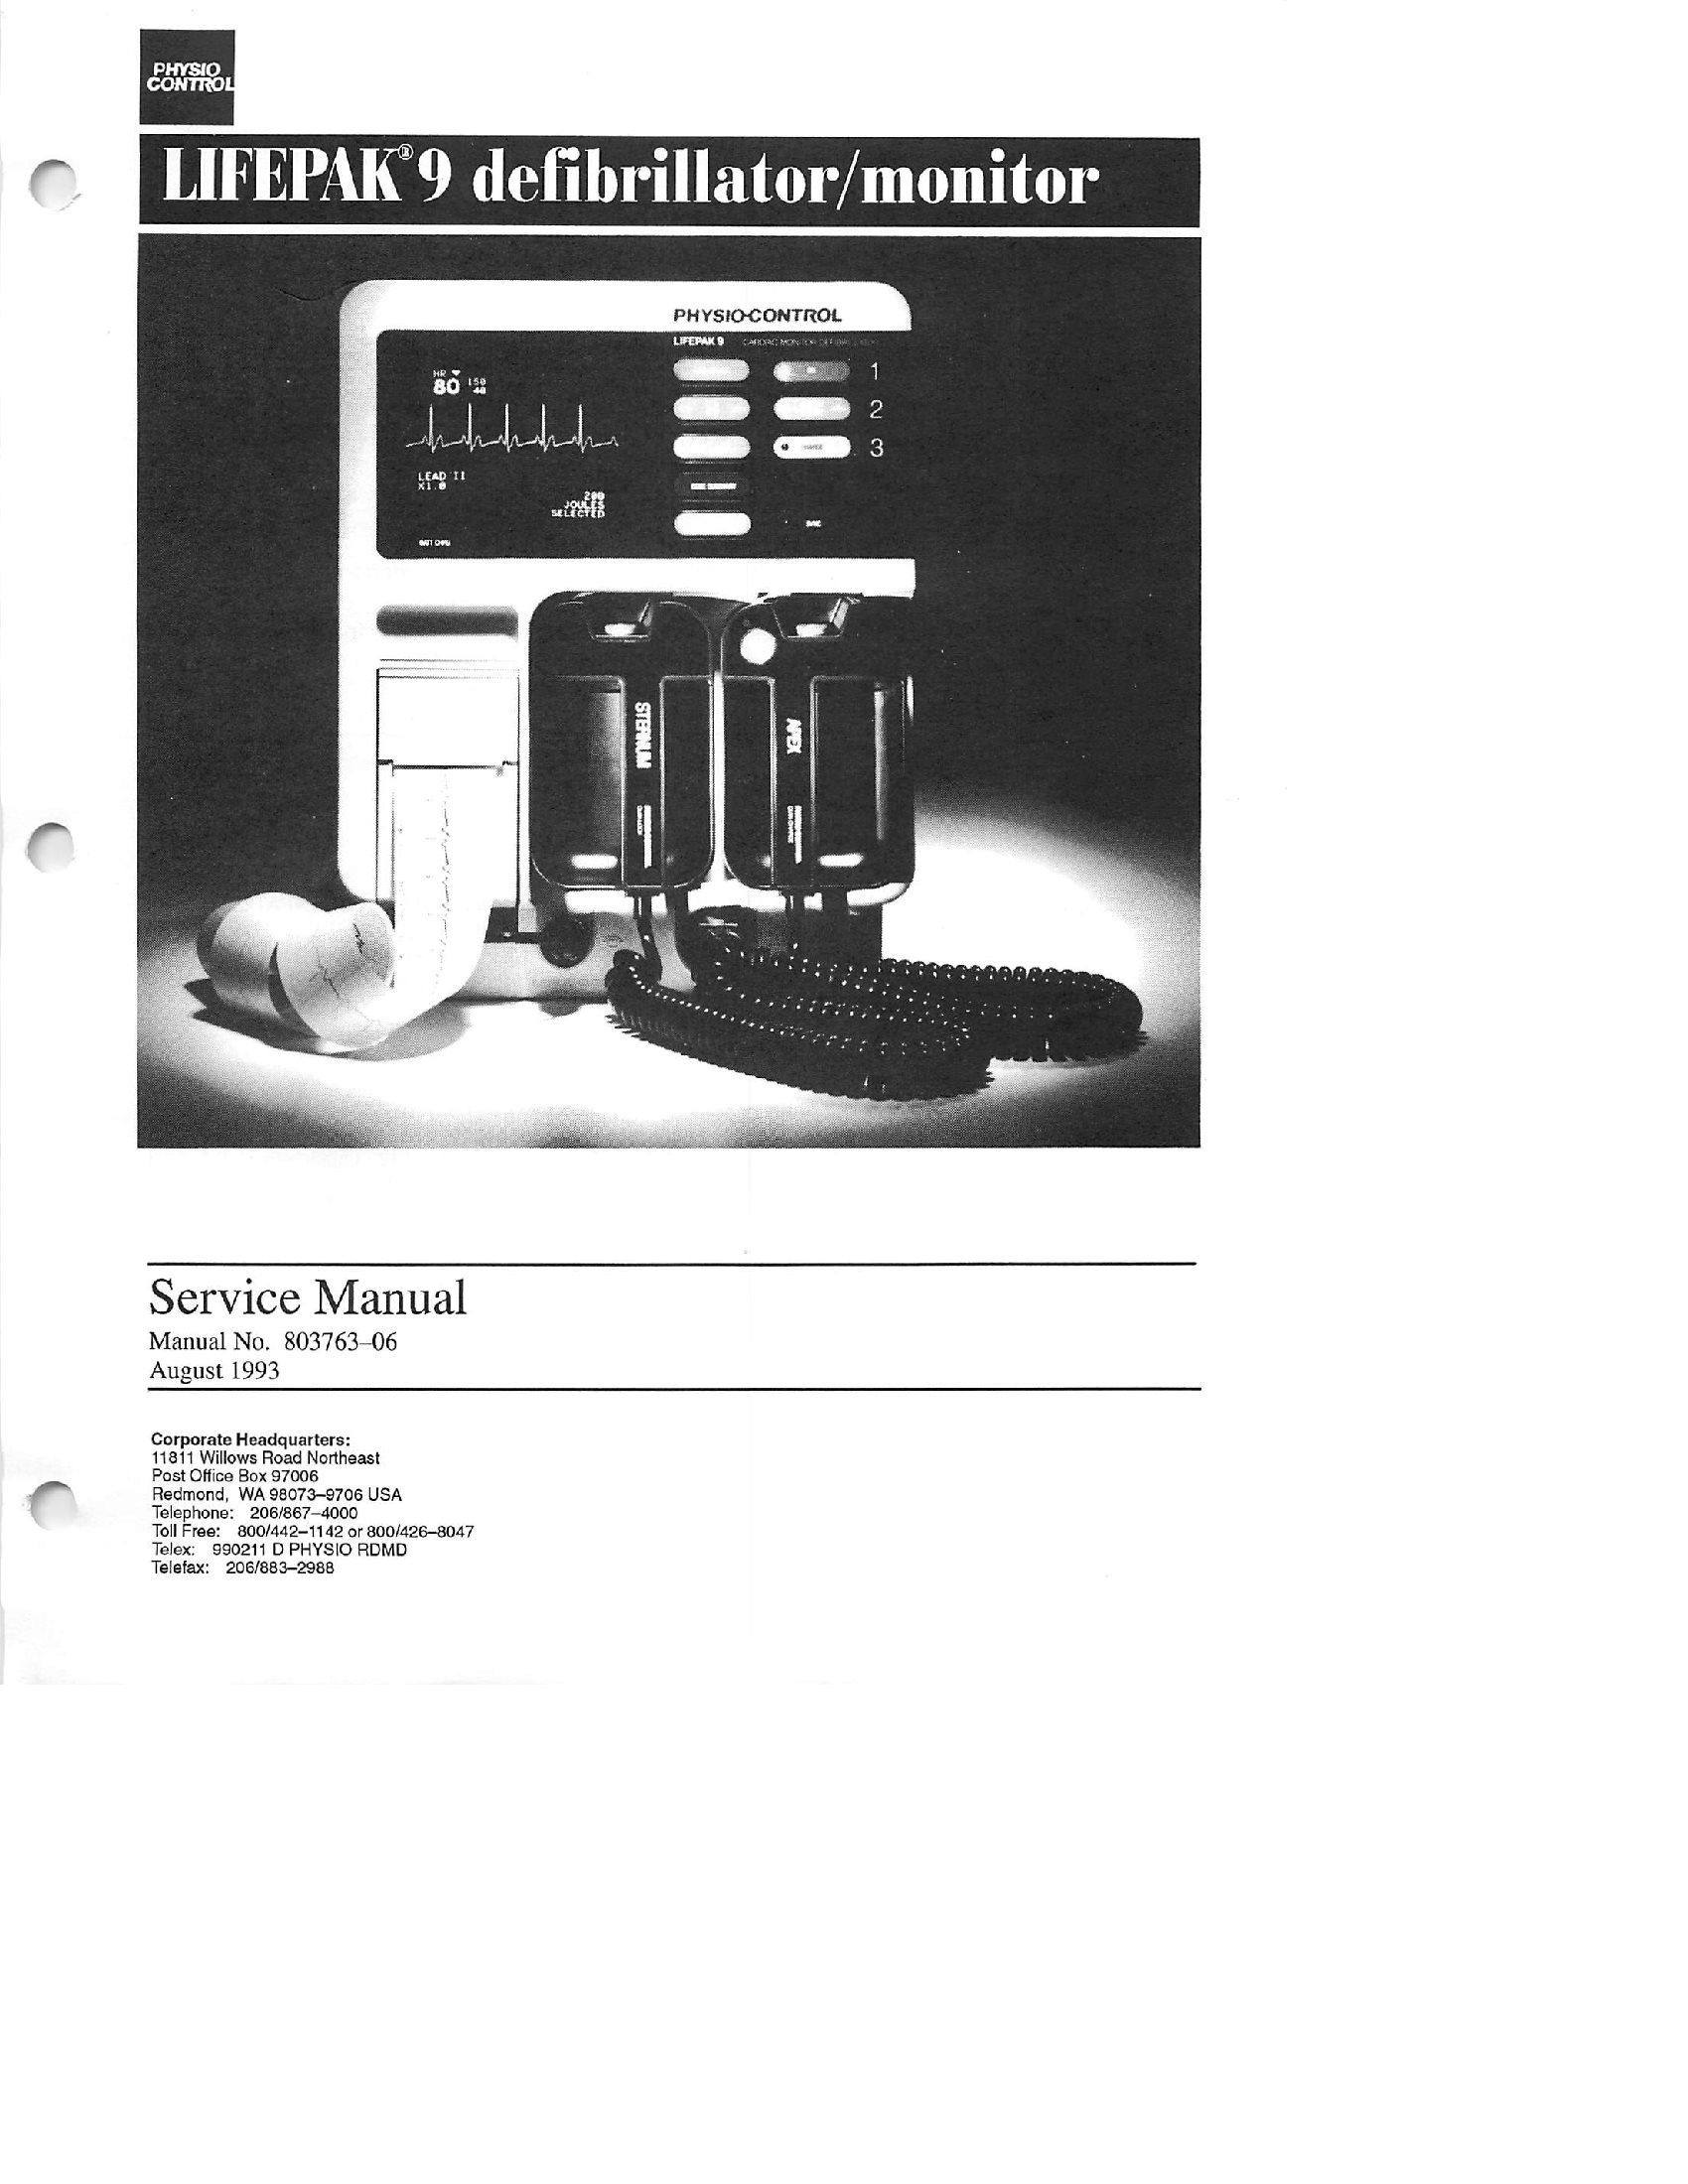 Physio Control Lifepak 9 Service manual